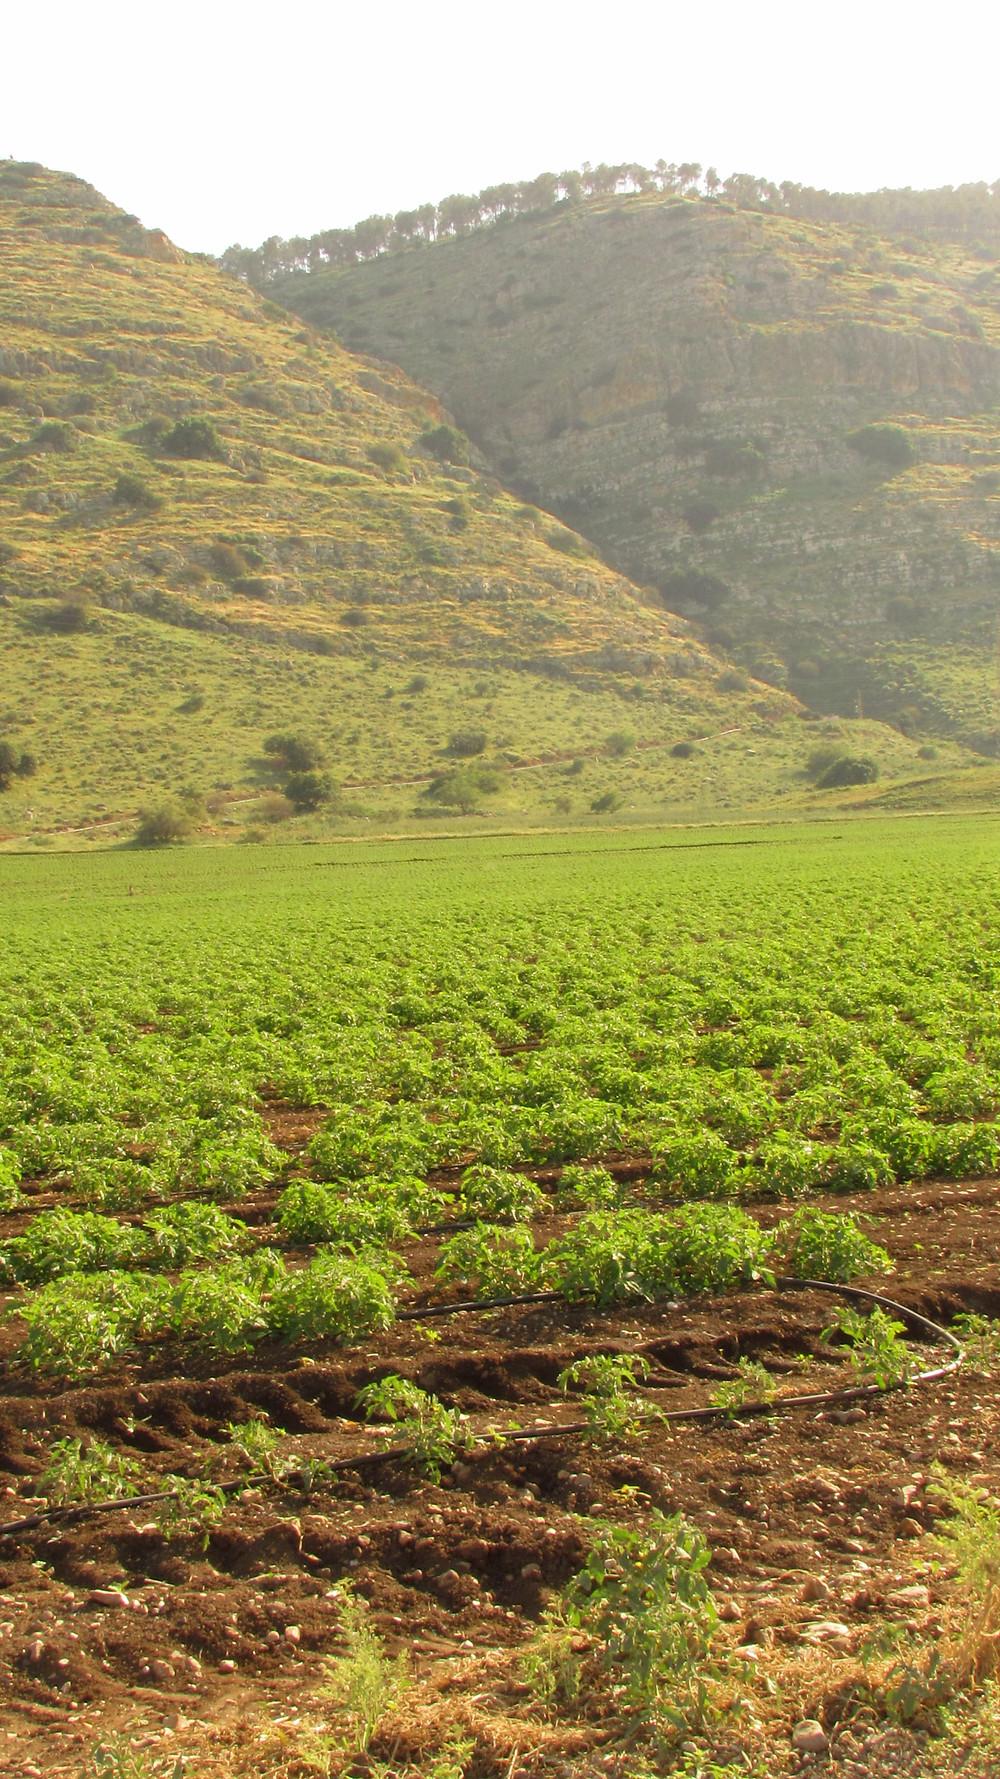 The Vanishing Valley - Gilboa Mts.